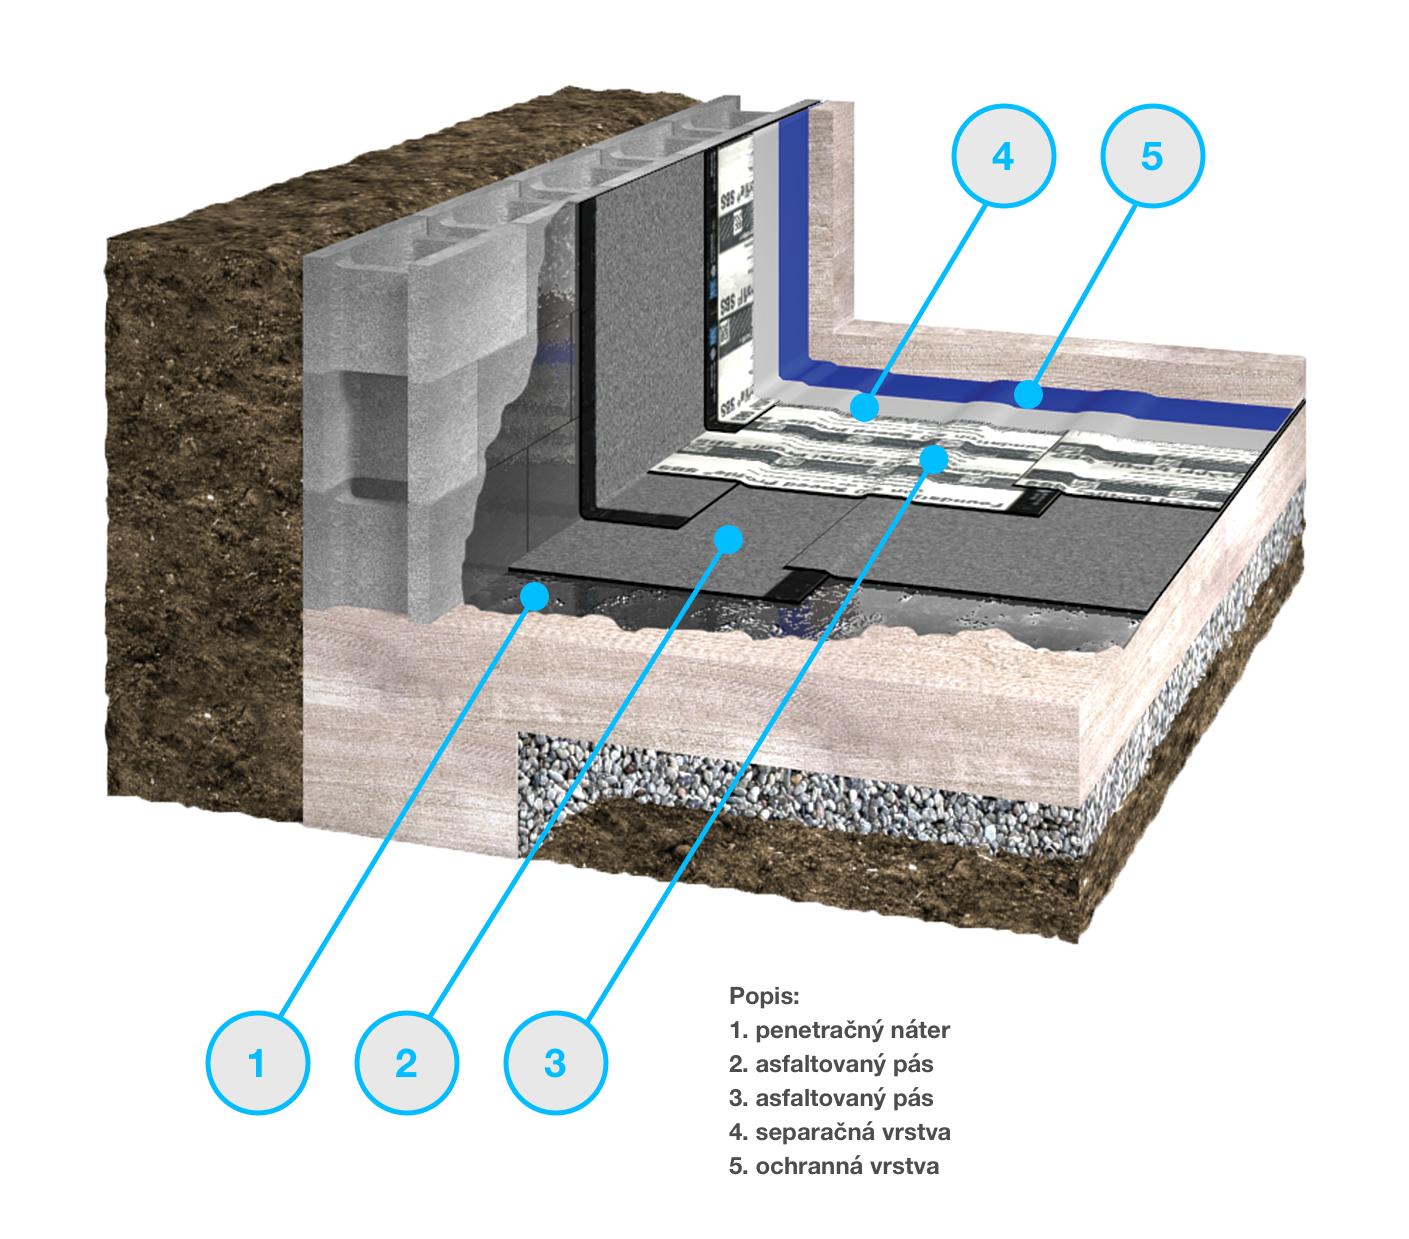 penetracny-nater-zaklady-asfalt-ochranna-vrstva-separacna-vrstva-hydroizolacia